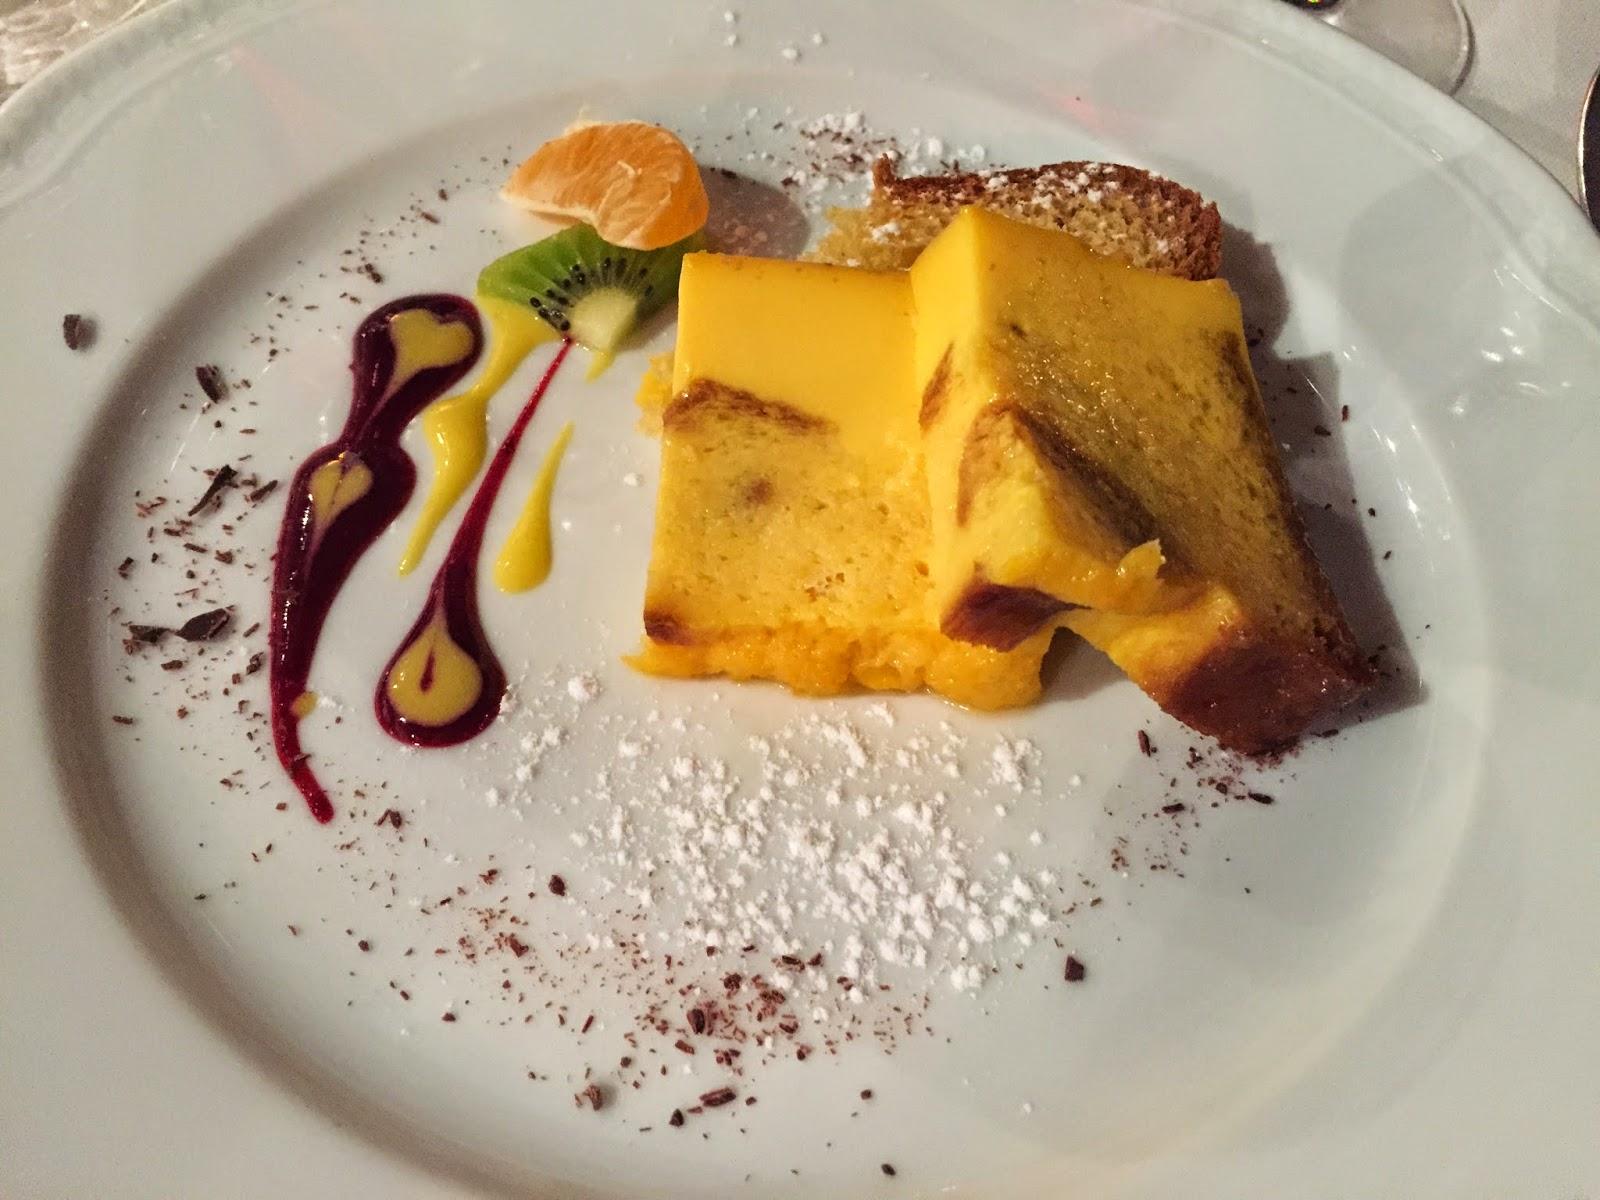 dessert at Enoteca della Valpolicella